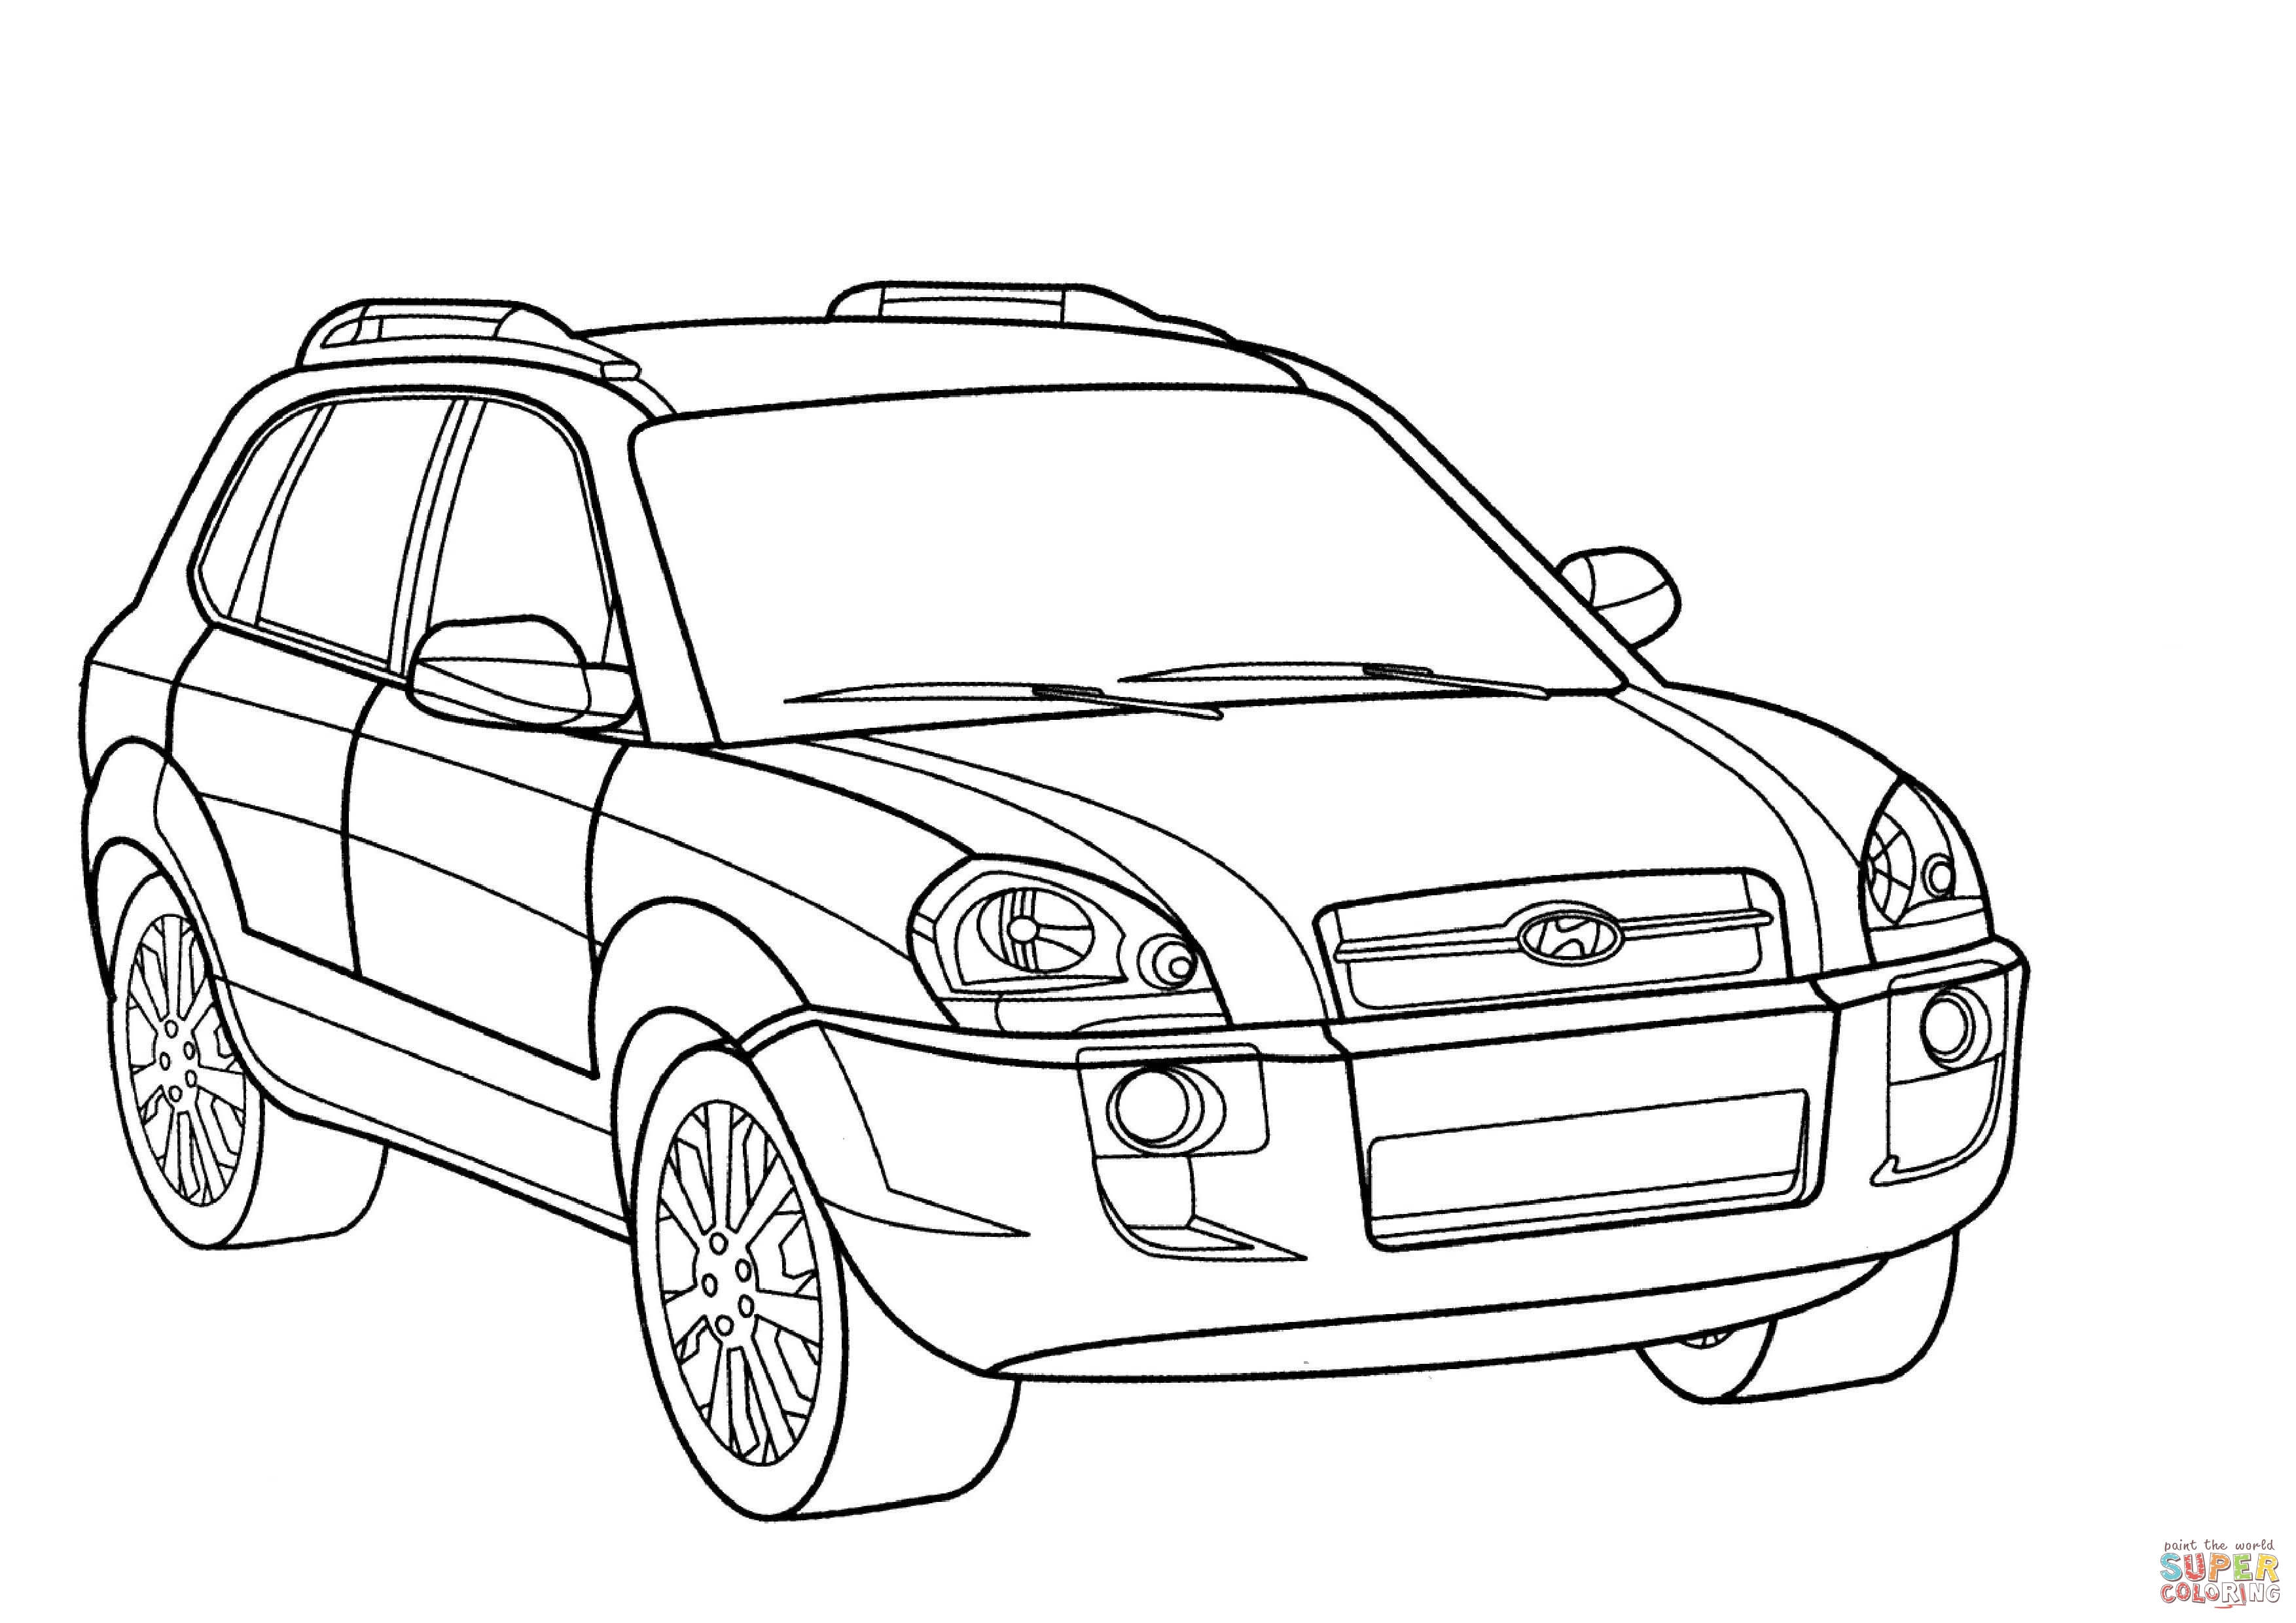 Hyundai Tucson Coloring Page